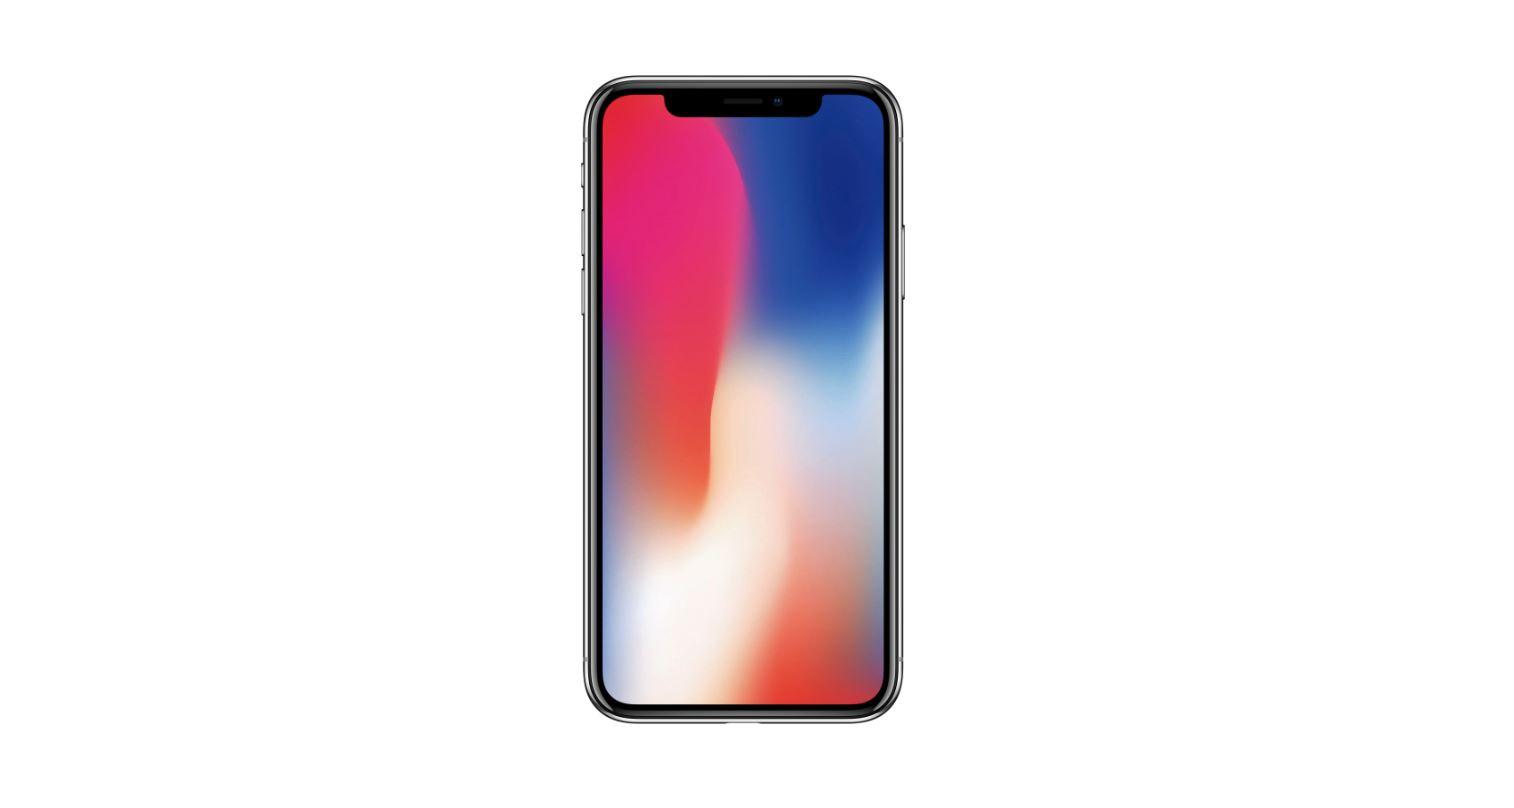 Apple еще неначала массовое производство iPhone X